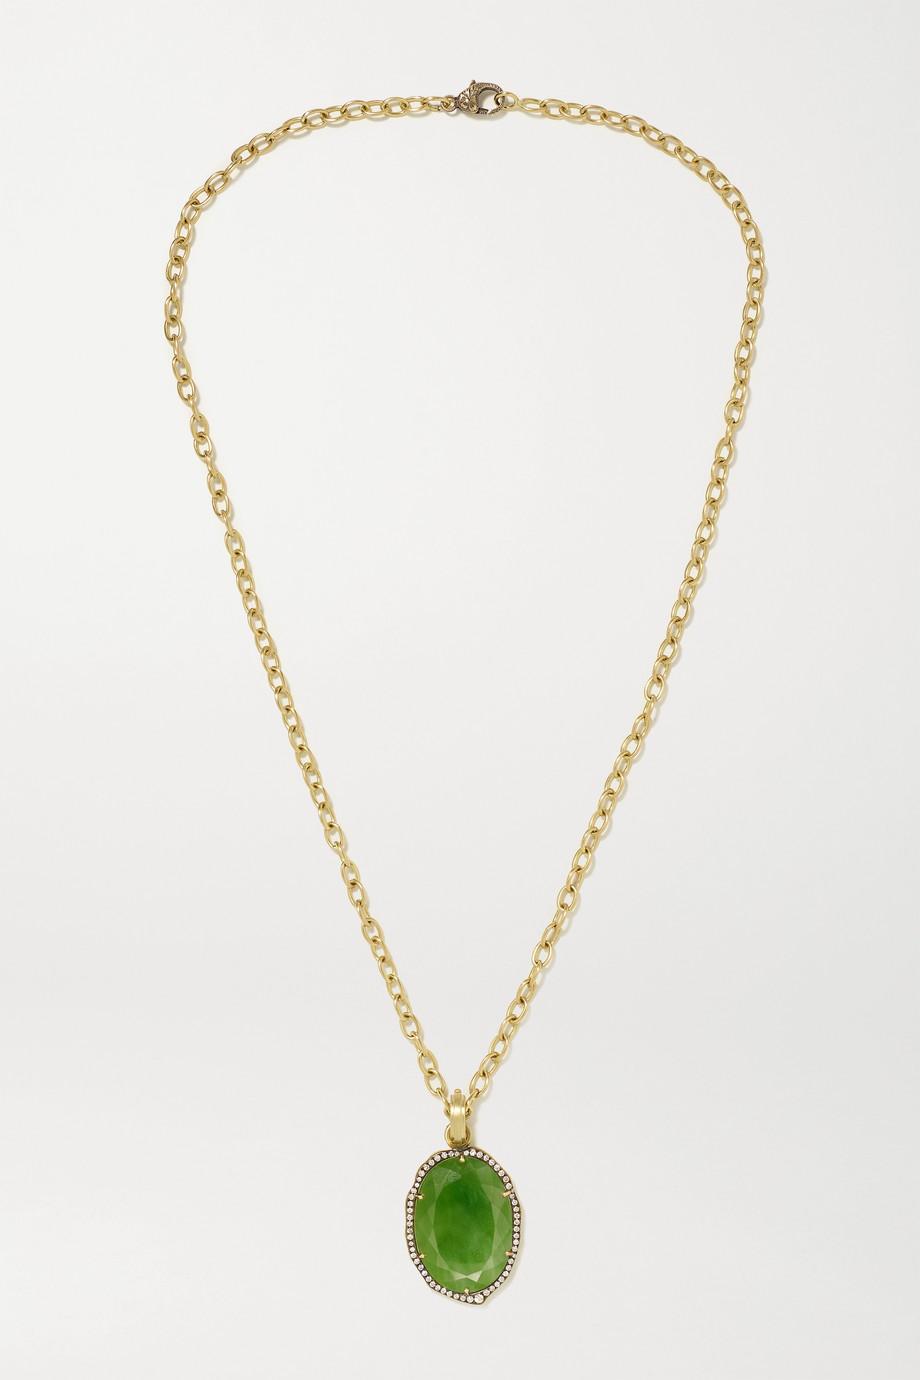 Sylva & Cie 18-karat gold, jade and diamond necklace